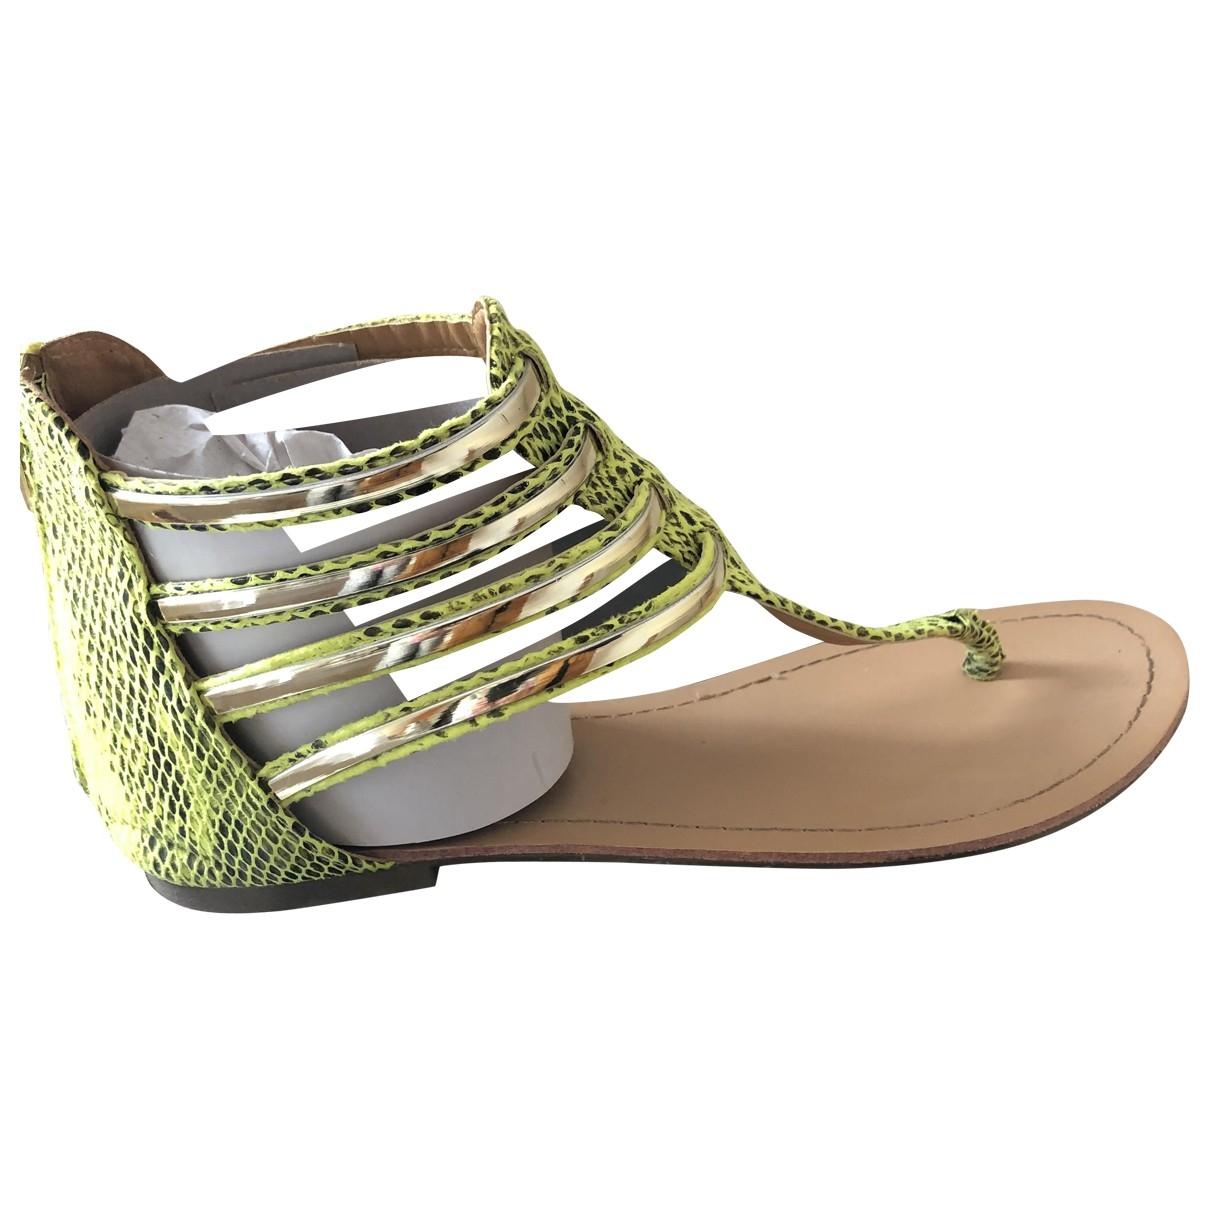 Kurt Geiger \N Green Patent leather Sandals for Women 6 UK